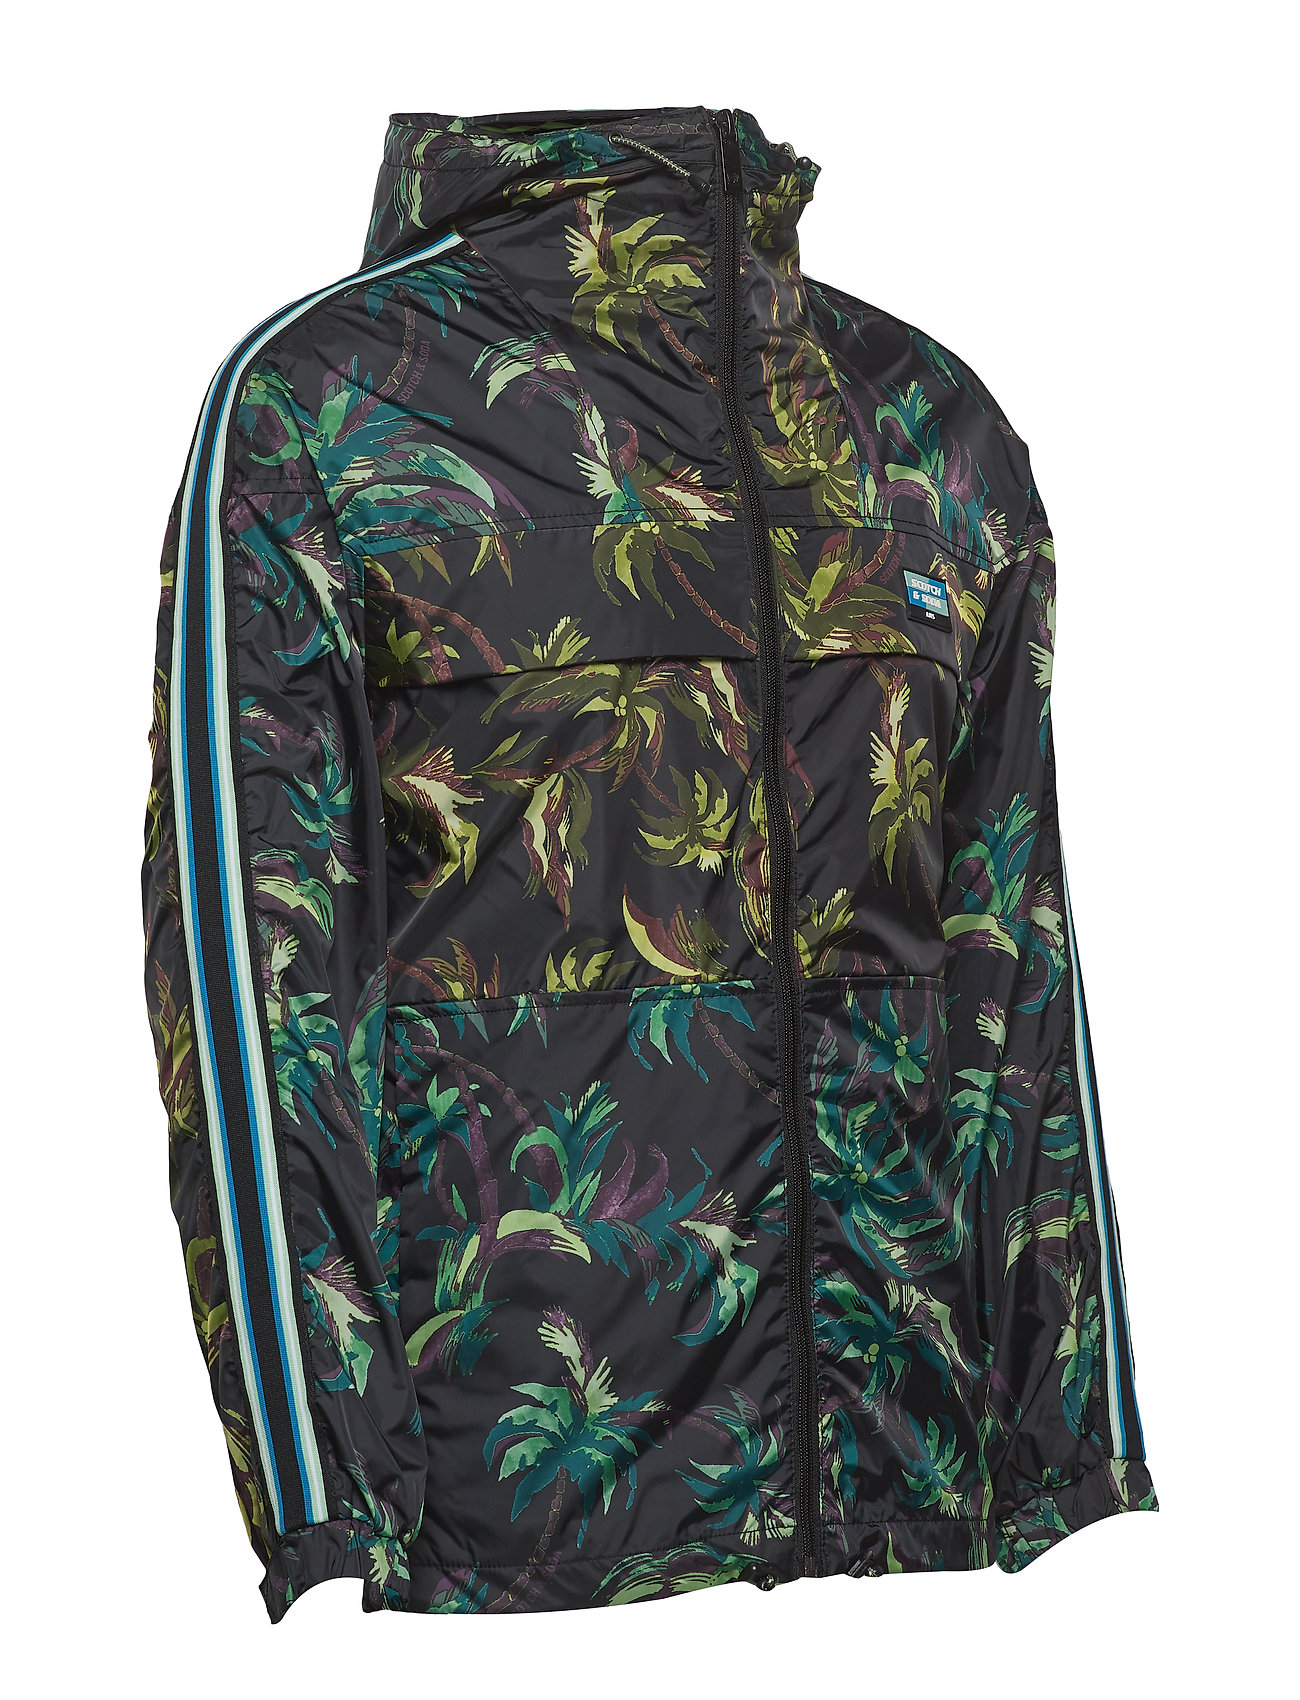 Jacket With AScotchamp; Soda Seasonal All Printcombo Signature Palm over SMpUzV